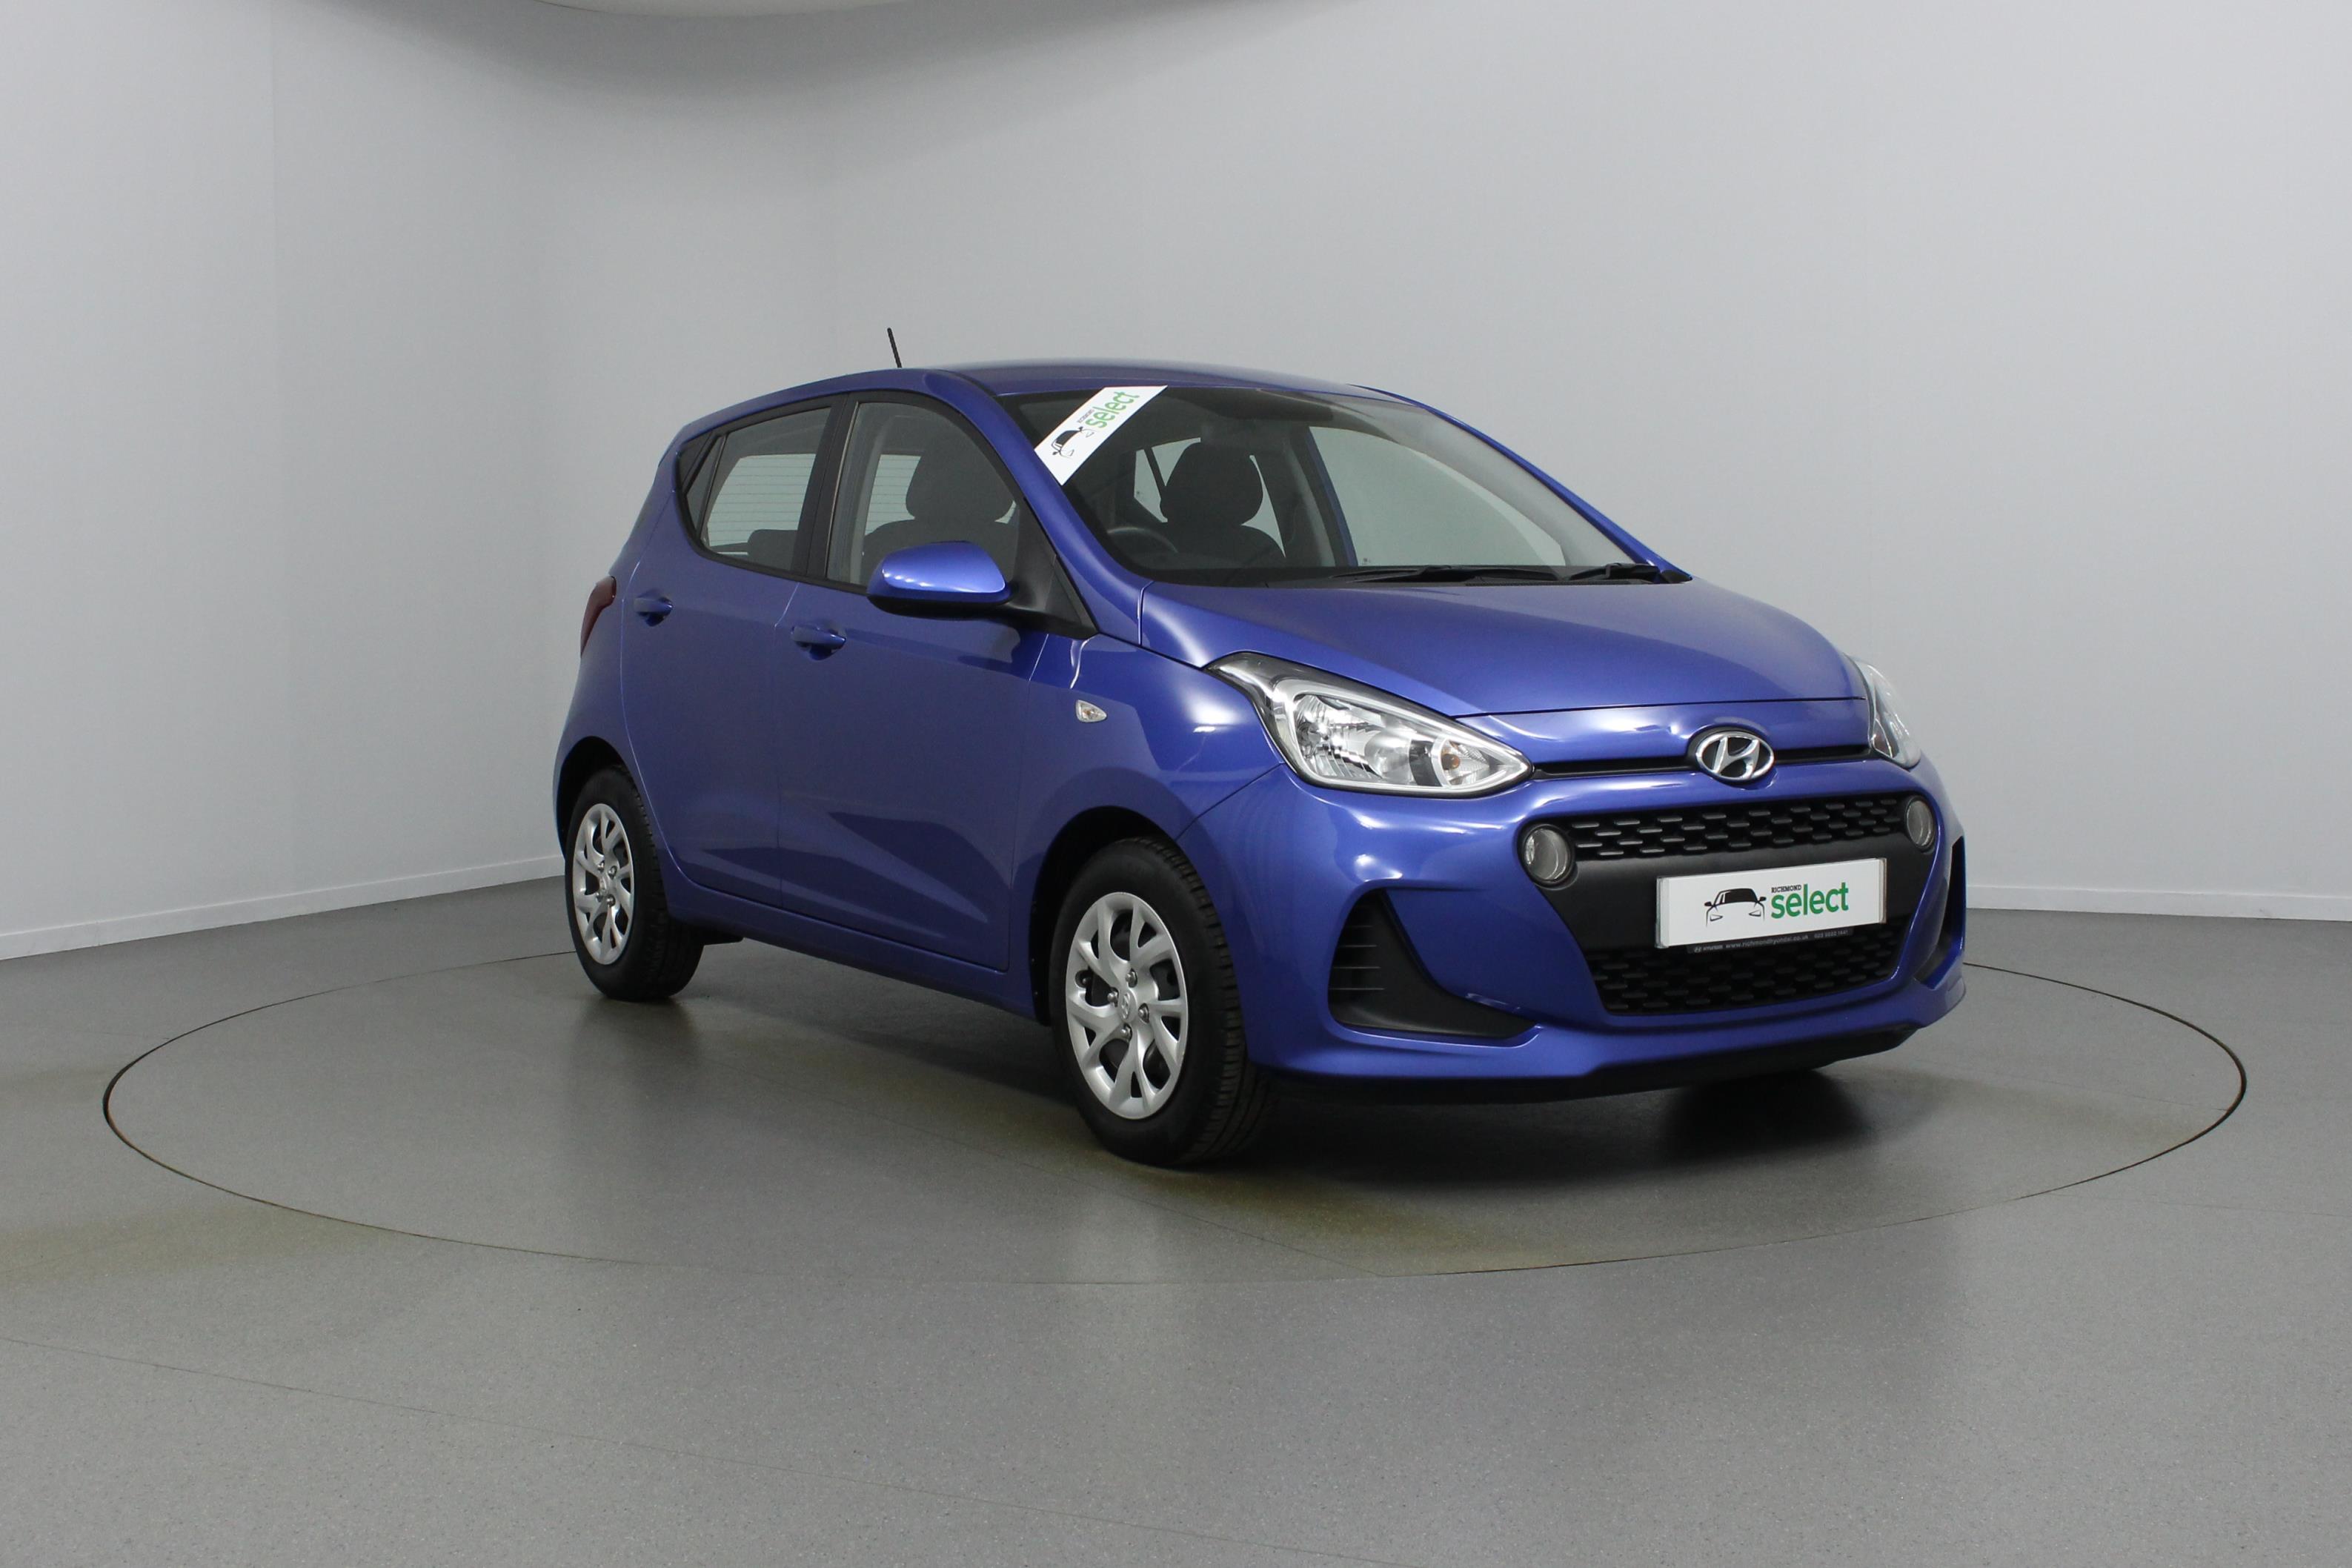 Hyundai I10 1 2 Se Colour Blue Price 8 492 Mileage 6 237 Richmond Motor Group